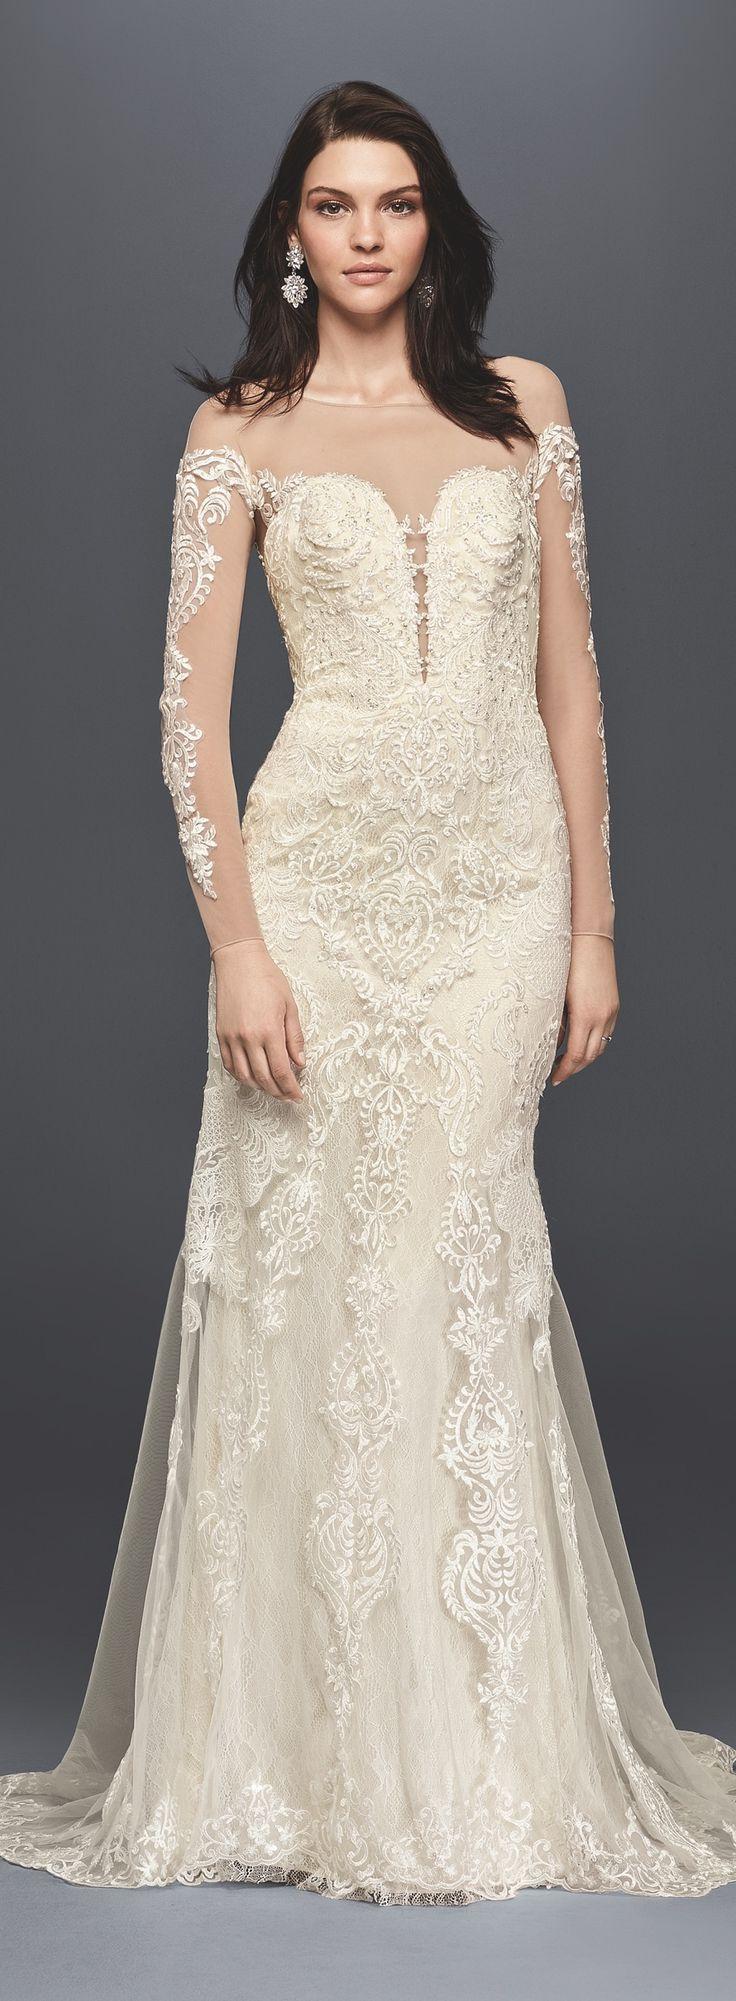 352 best bridal fashion images on pinterest wedding dressses long sleeve illusion lace wedding dress davids bridal spring 2017 davidsbridal galinasignature ombrellifo Images